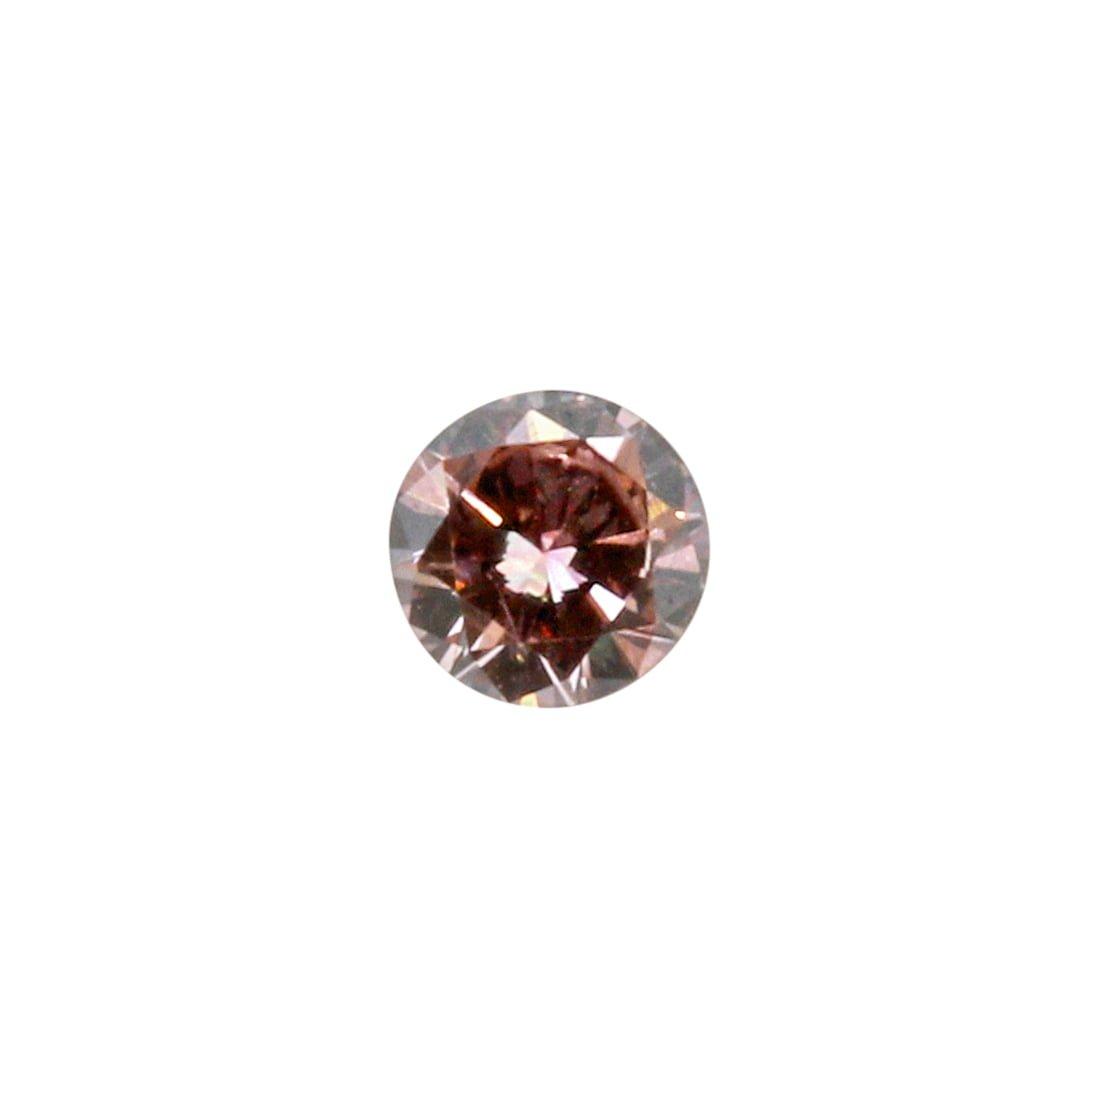 0.18ct Natural Fancy Pink Argyle Diamond